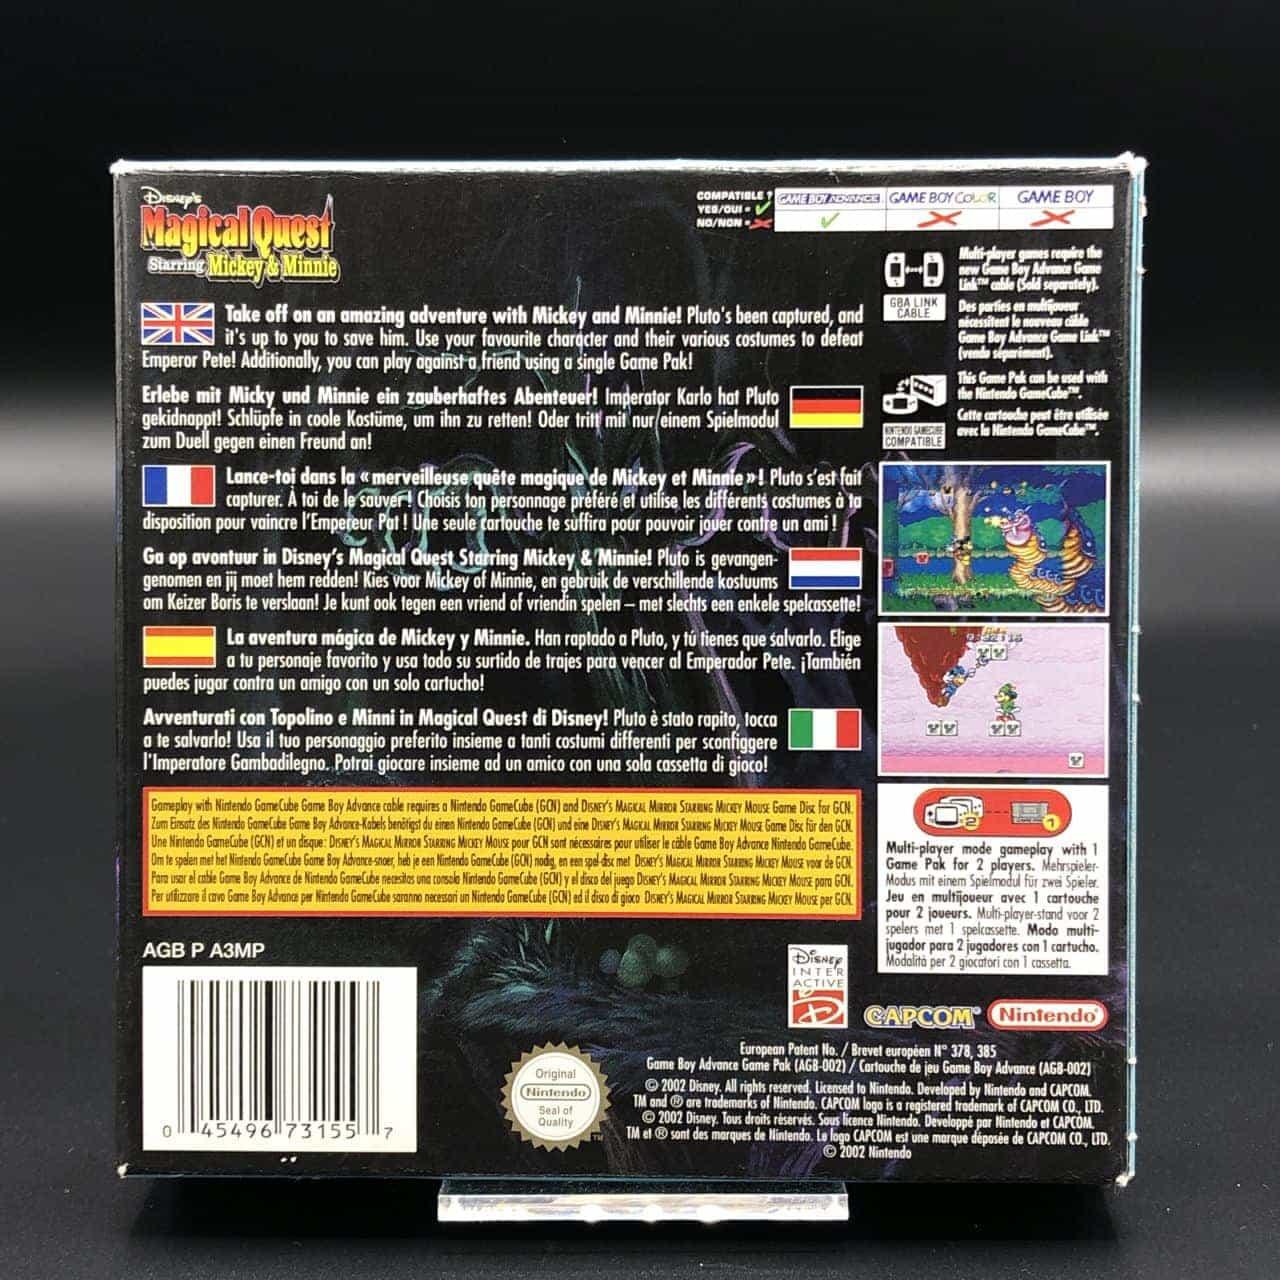 GBA Disney's Magical Quest Starring Mickey & Minnie (Komplett) (Sehr gut) Game Boy Advance